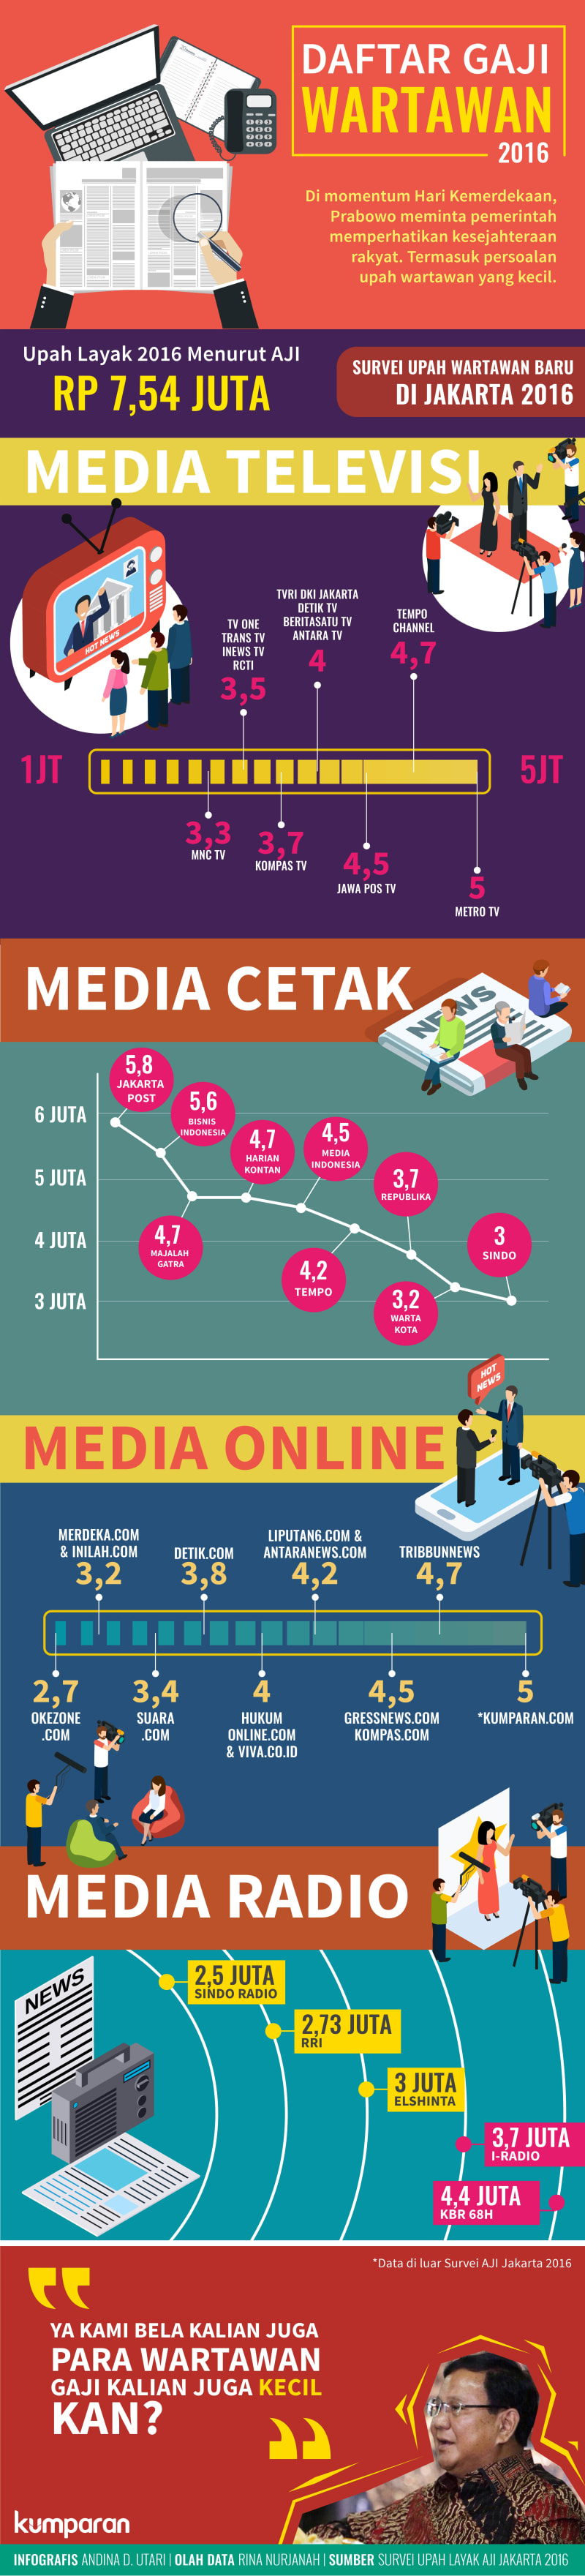 Infografis Daftar Gaji Wartawan 2016